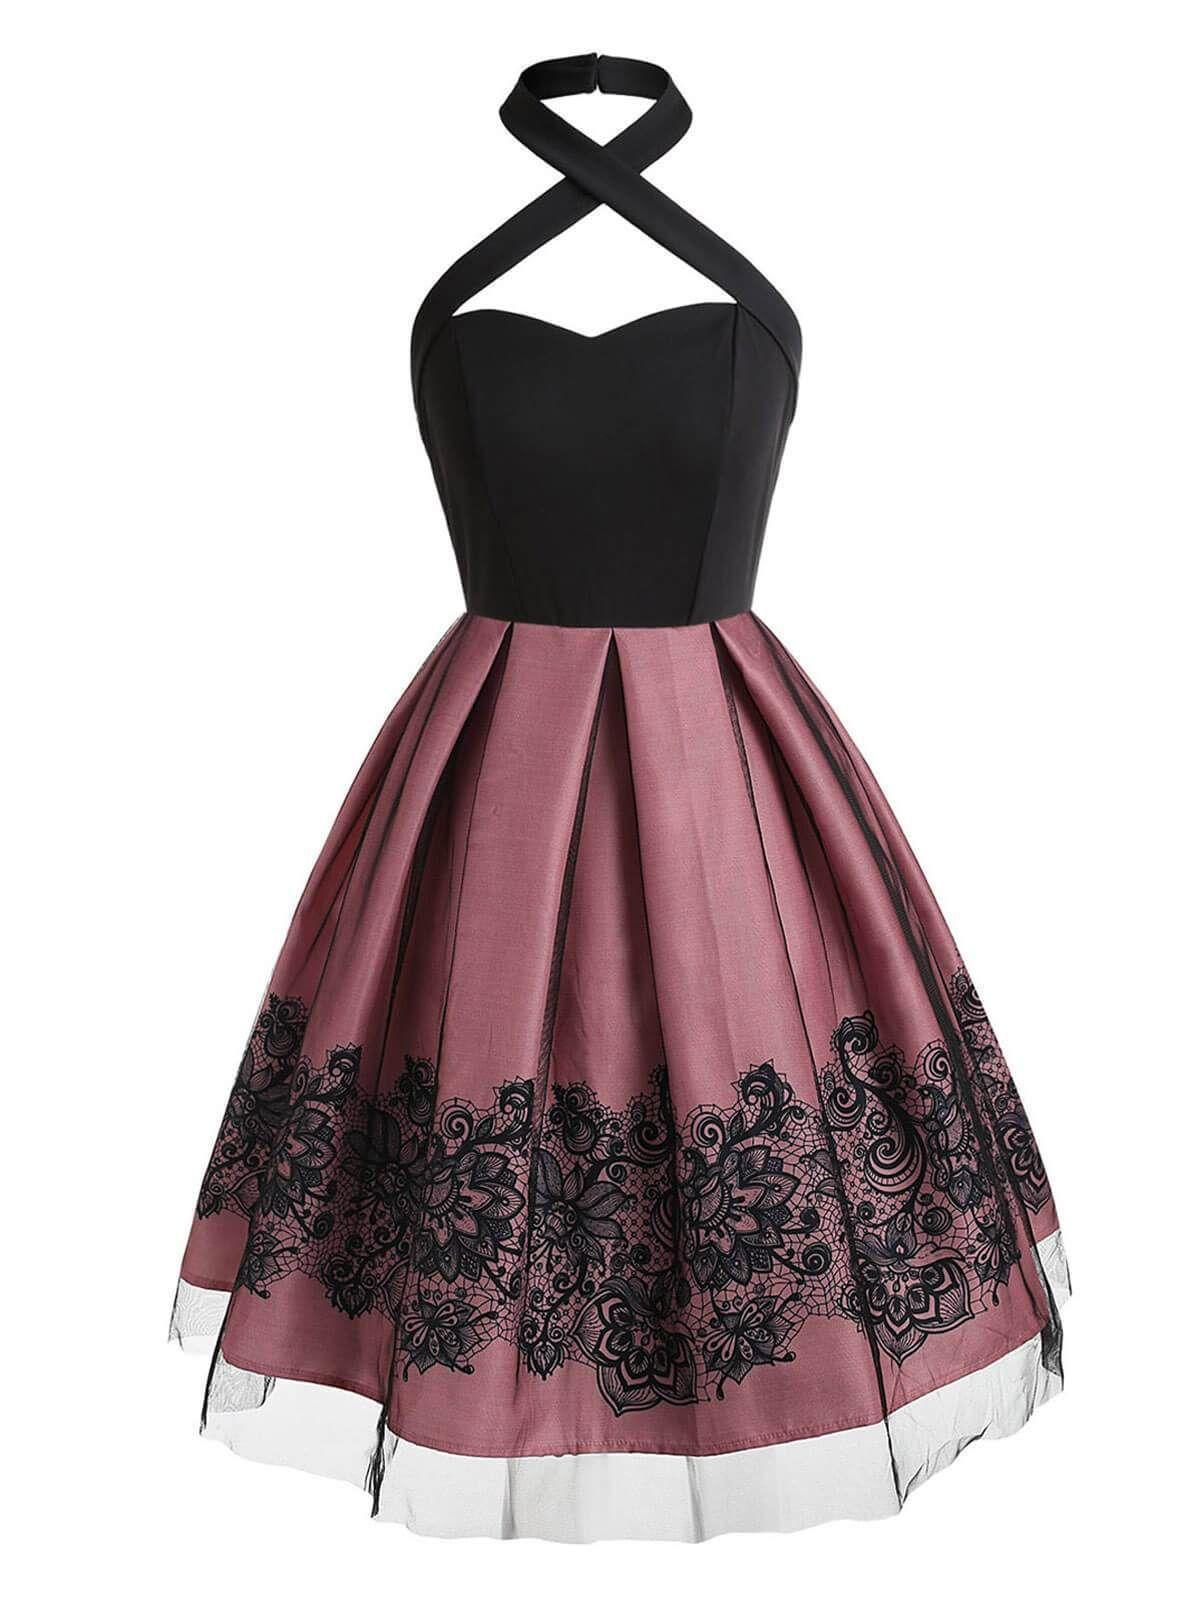 1950s Halter Patchwork Swing Dress